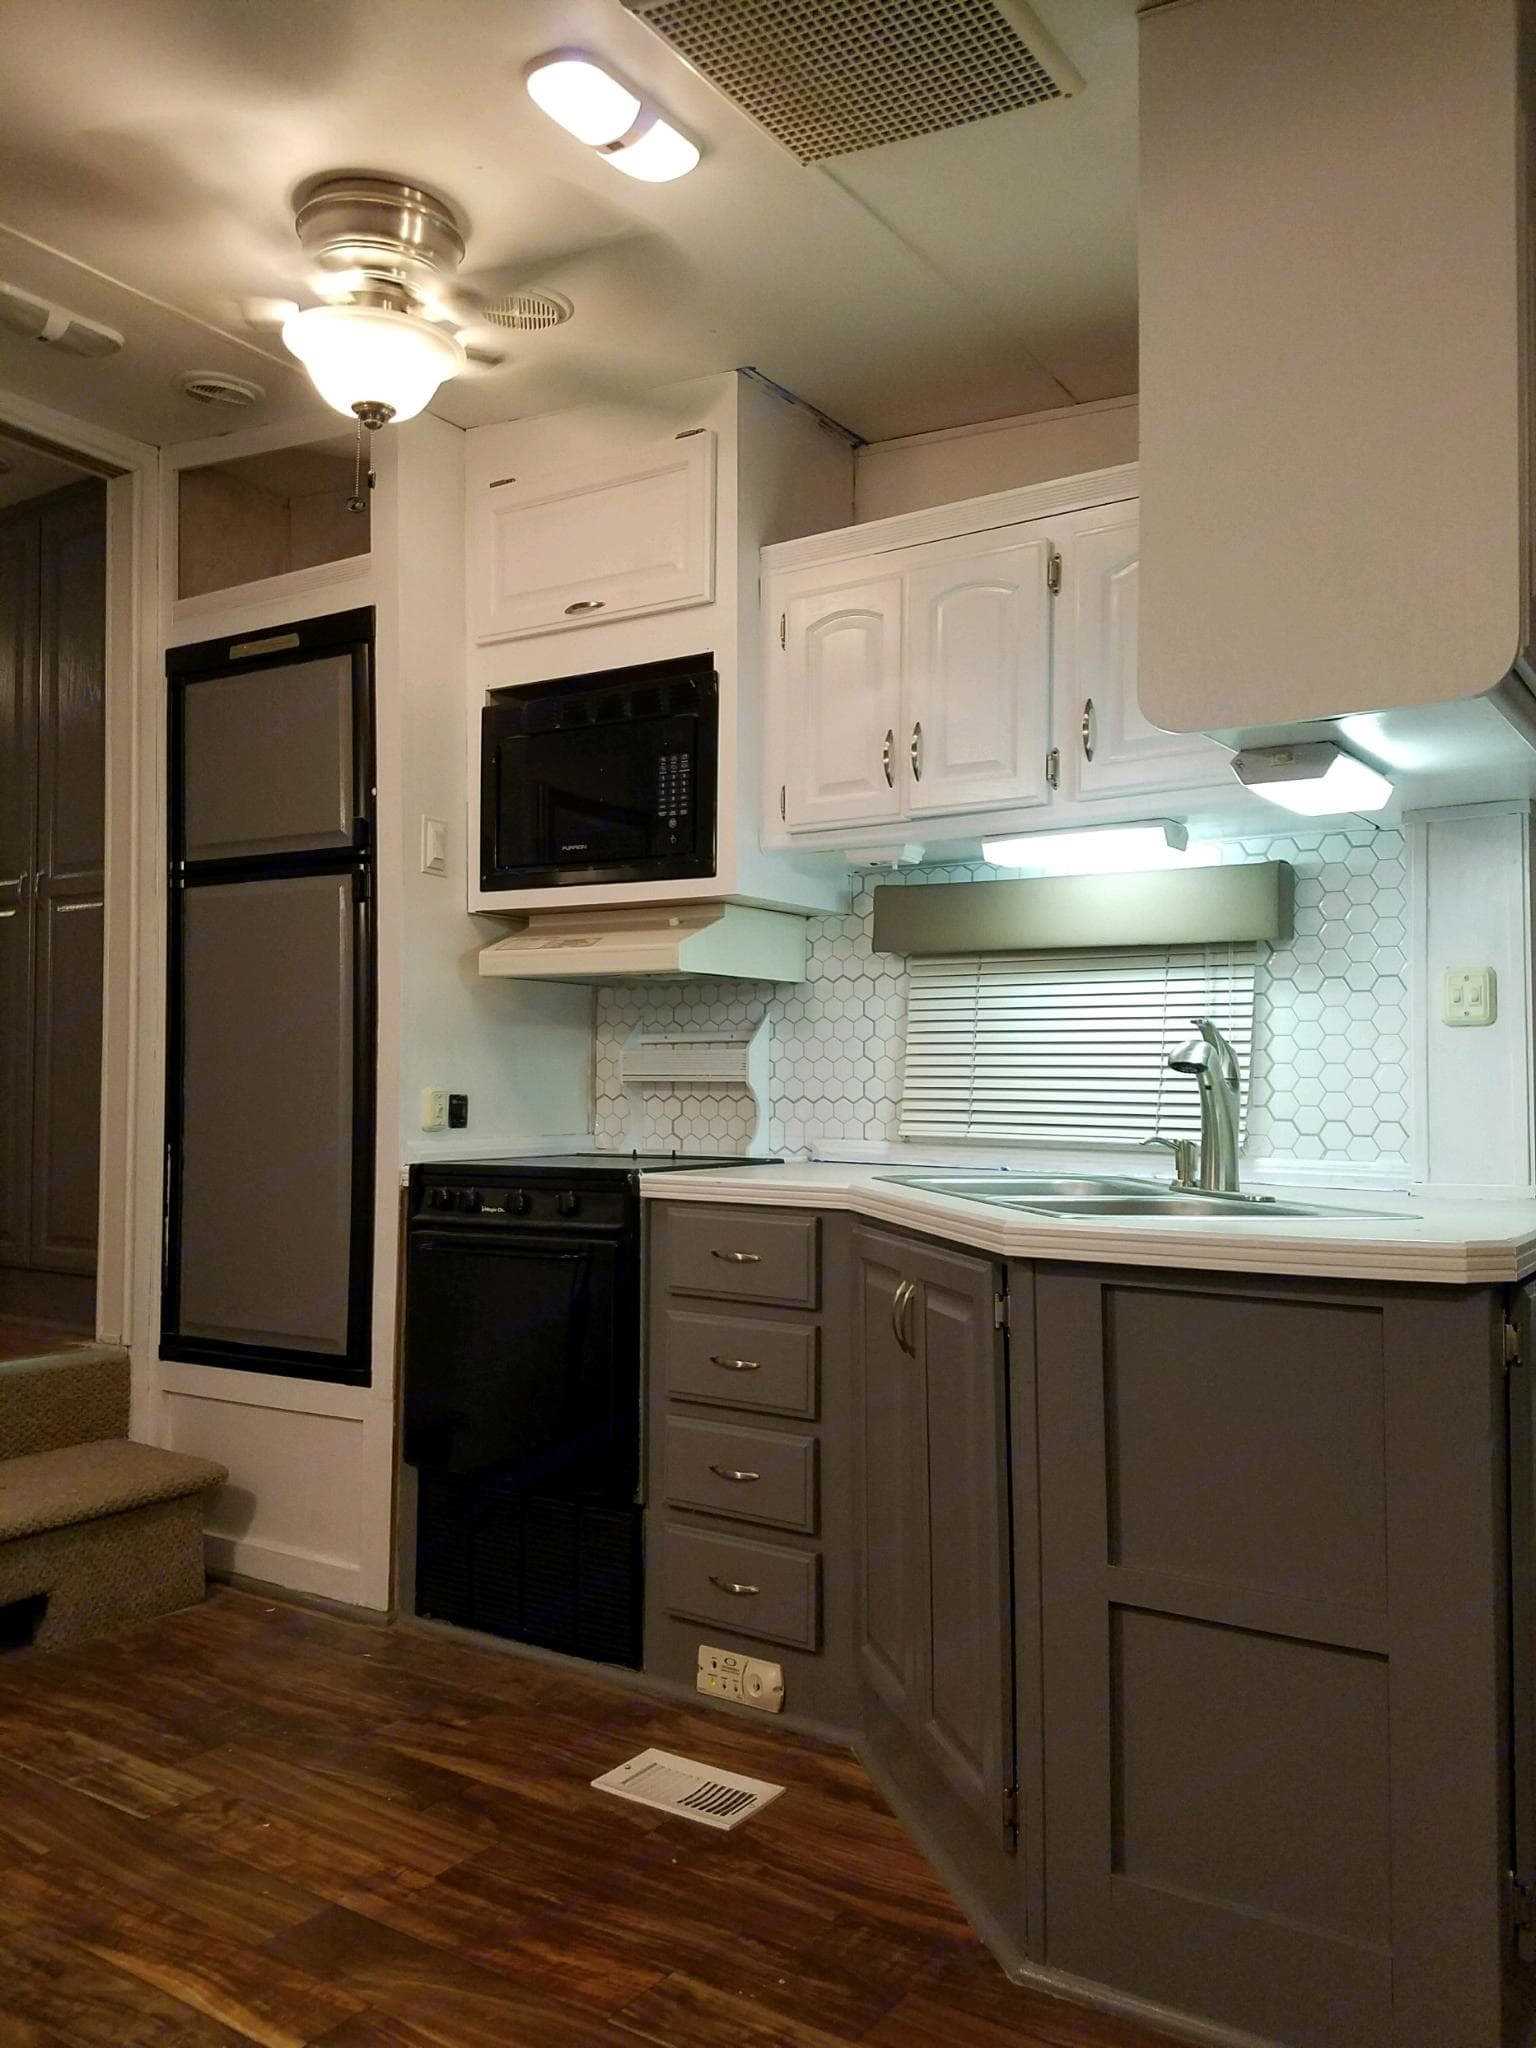 Fully furnished kitchen. Airstream Sea Hawk 1998